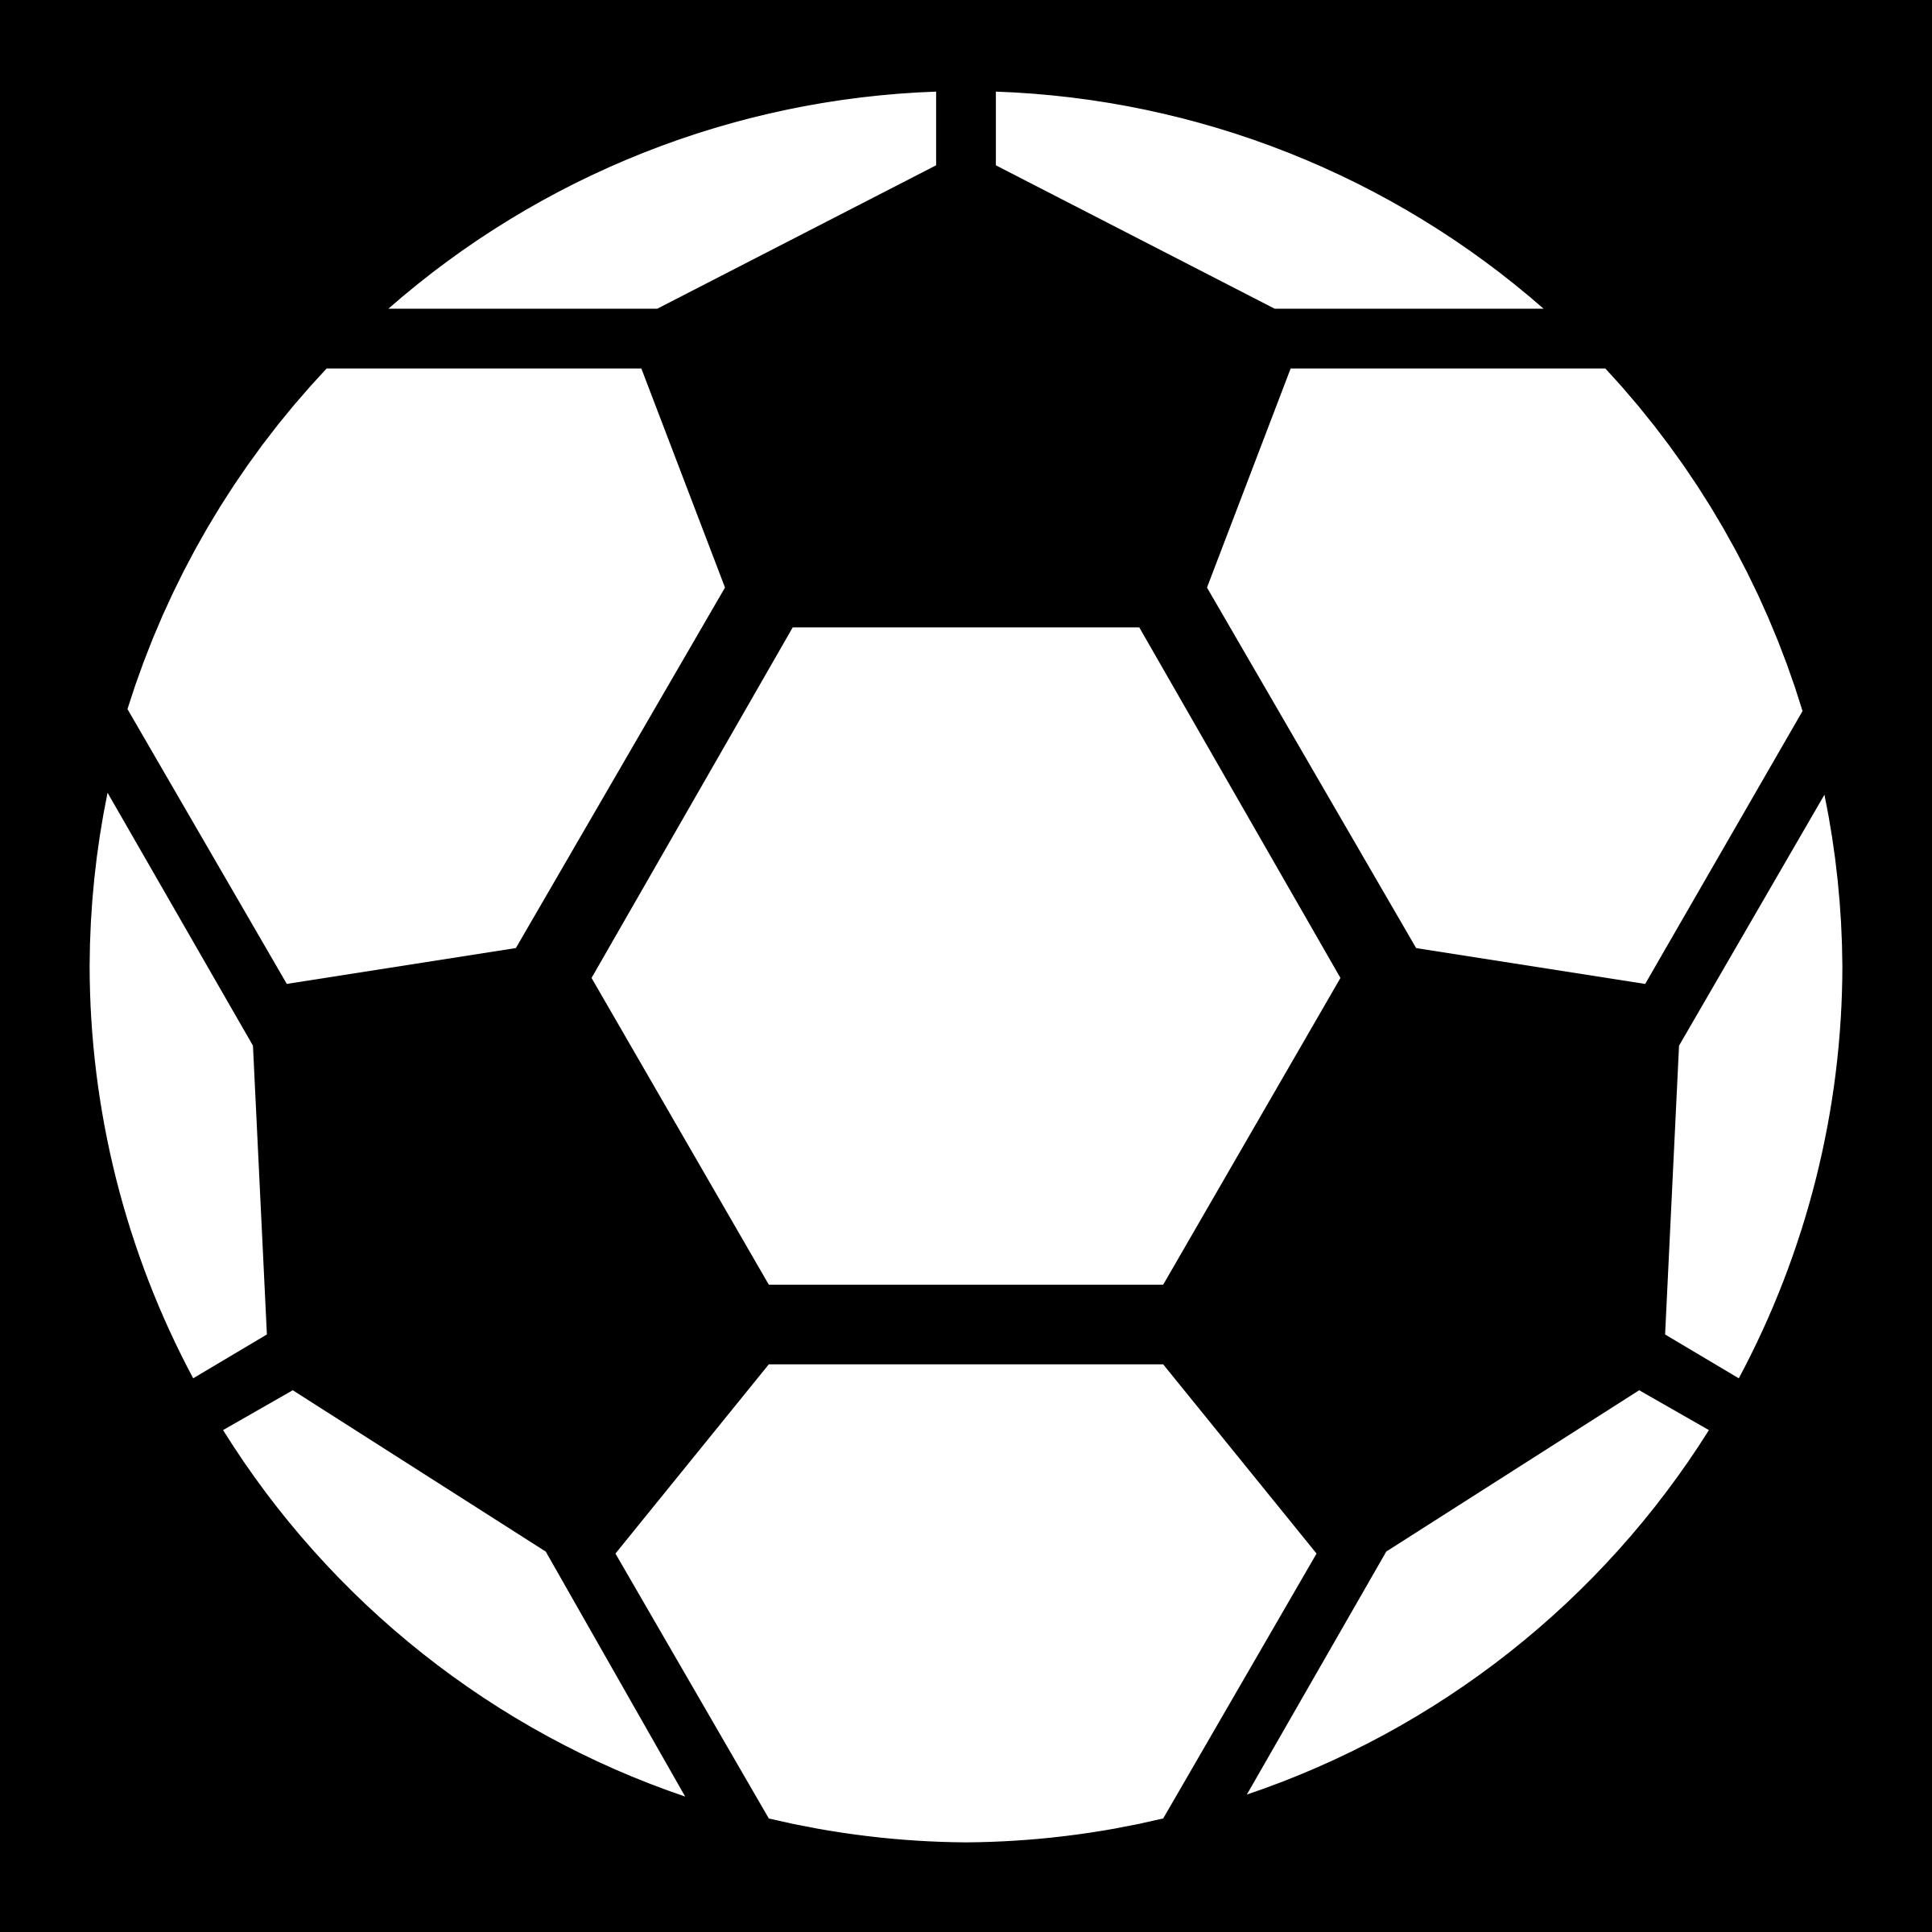 2400x2400 Clipart Soccer Ball Clipartcow